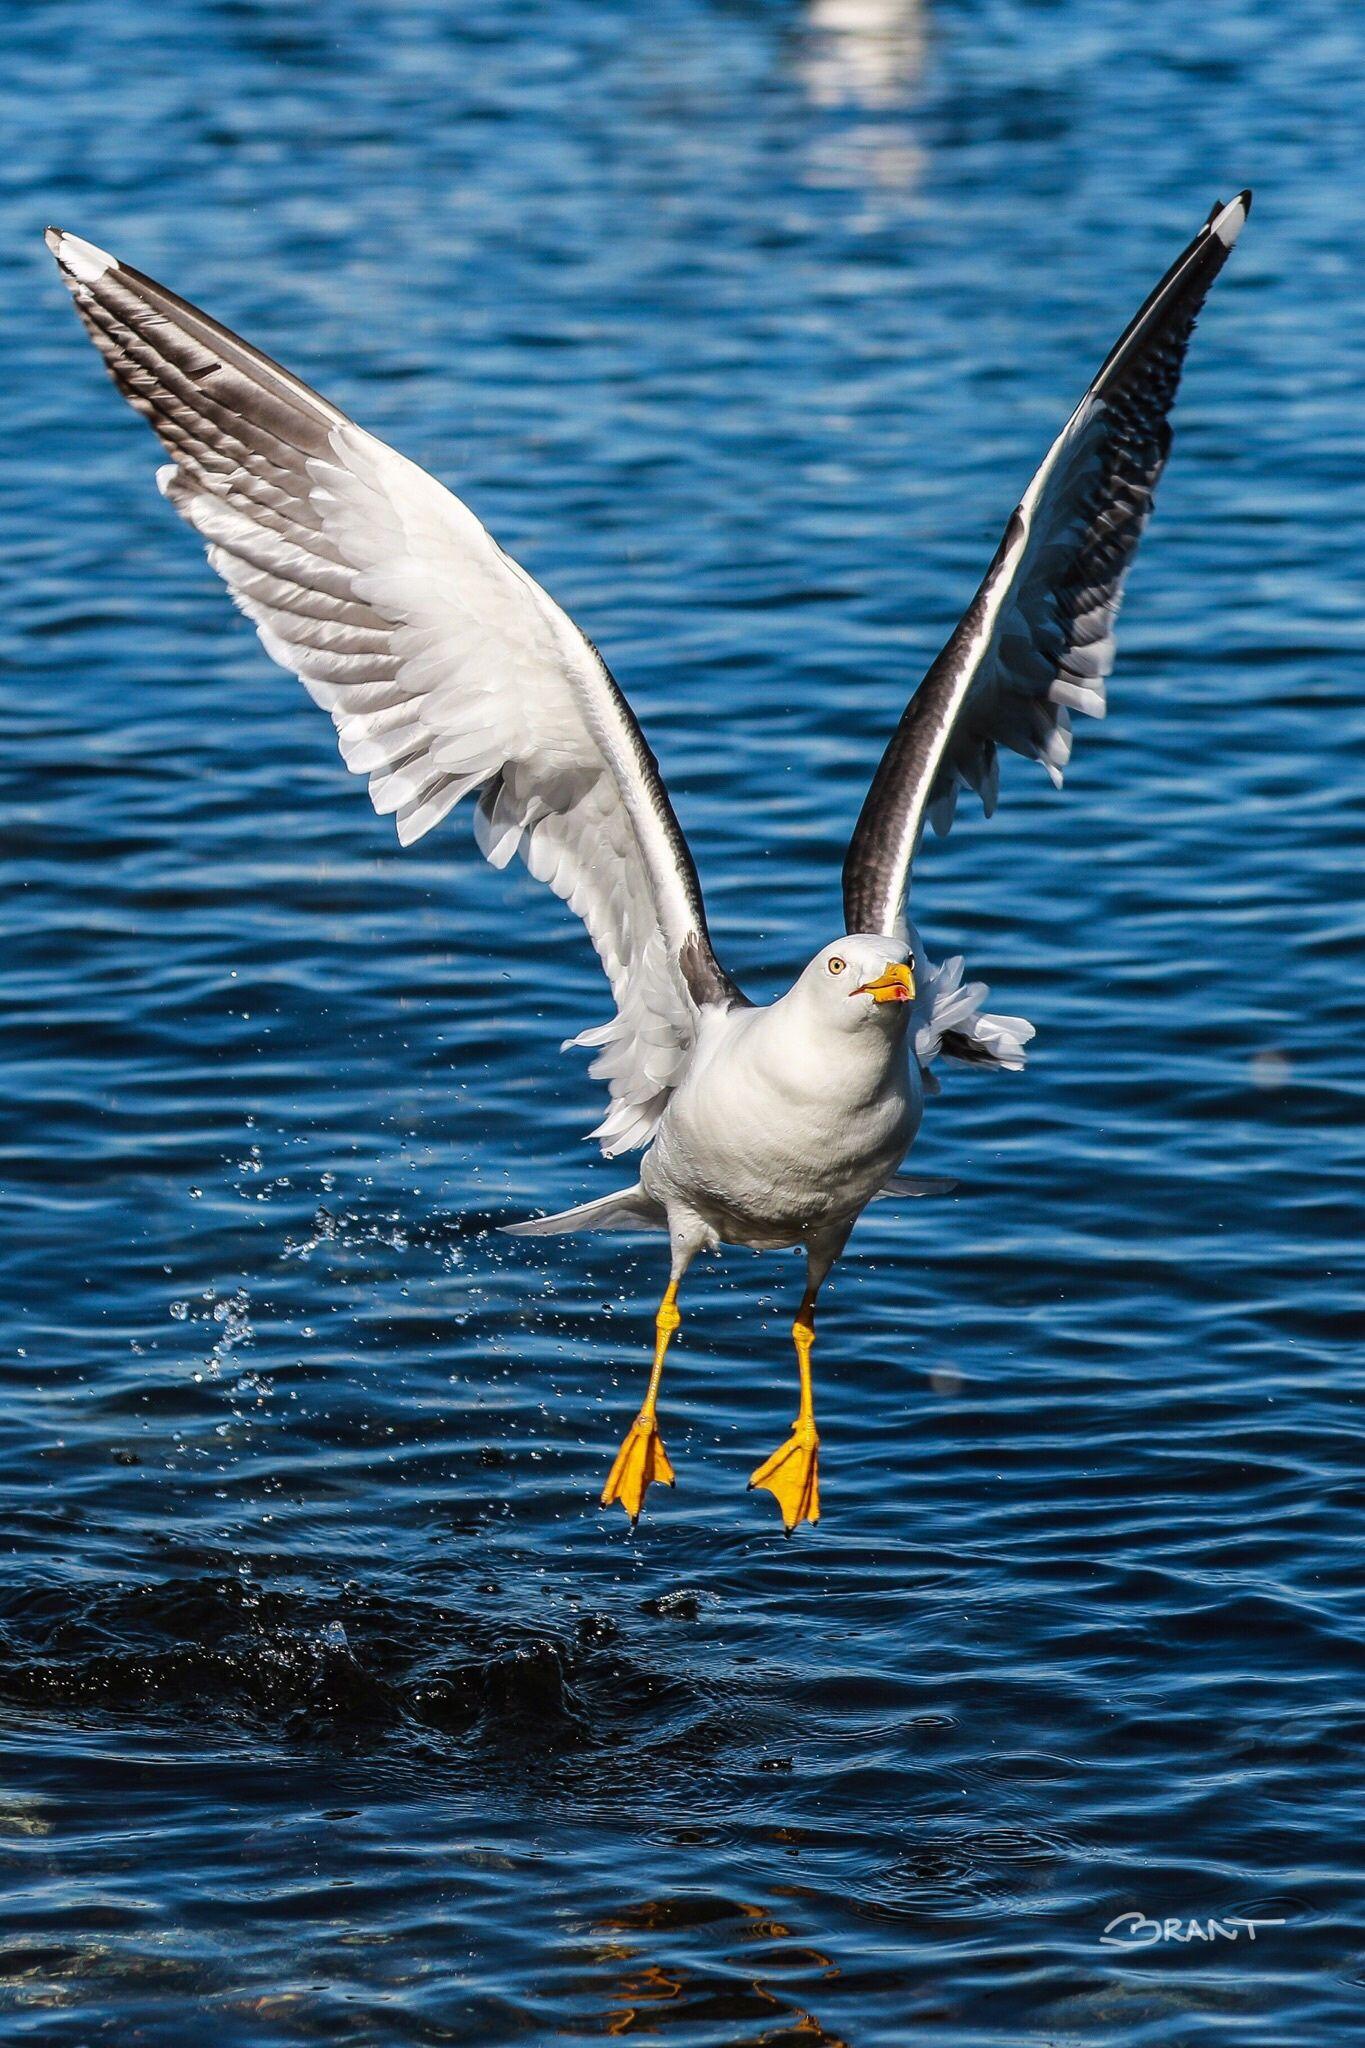 Seagull by Brant Fageraas | Ŧєคt♄єгє๔ Ŧгίєภ๔ร | Pinterest | Bird ...